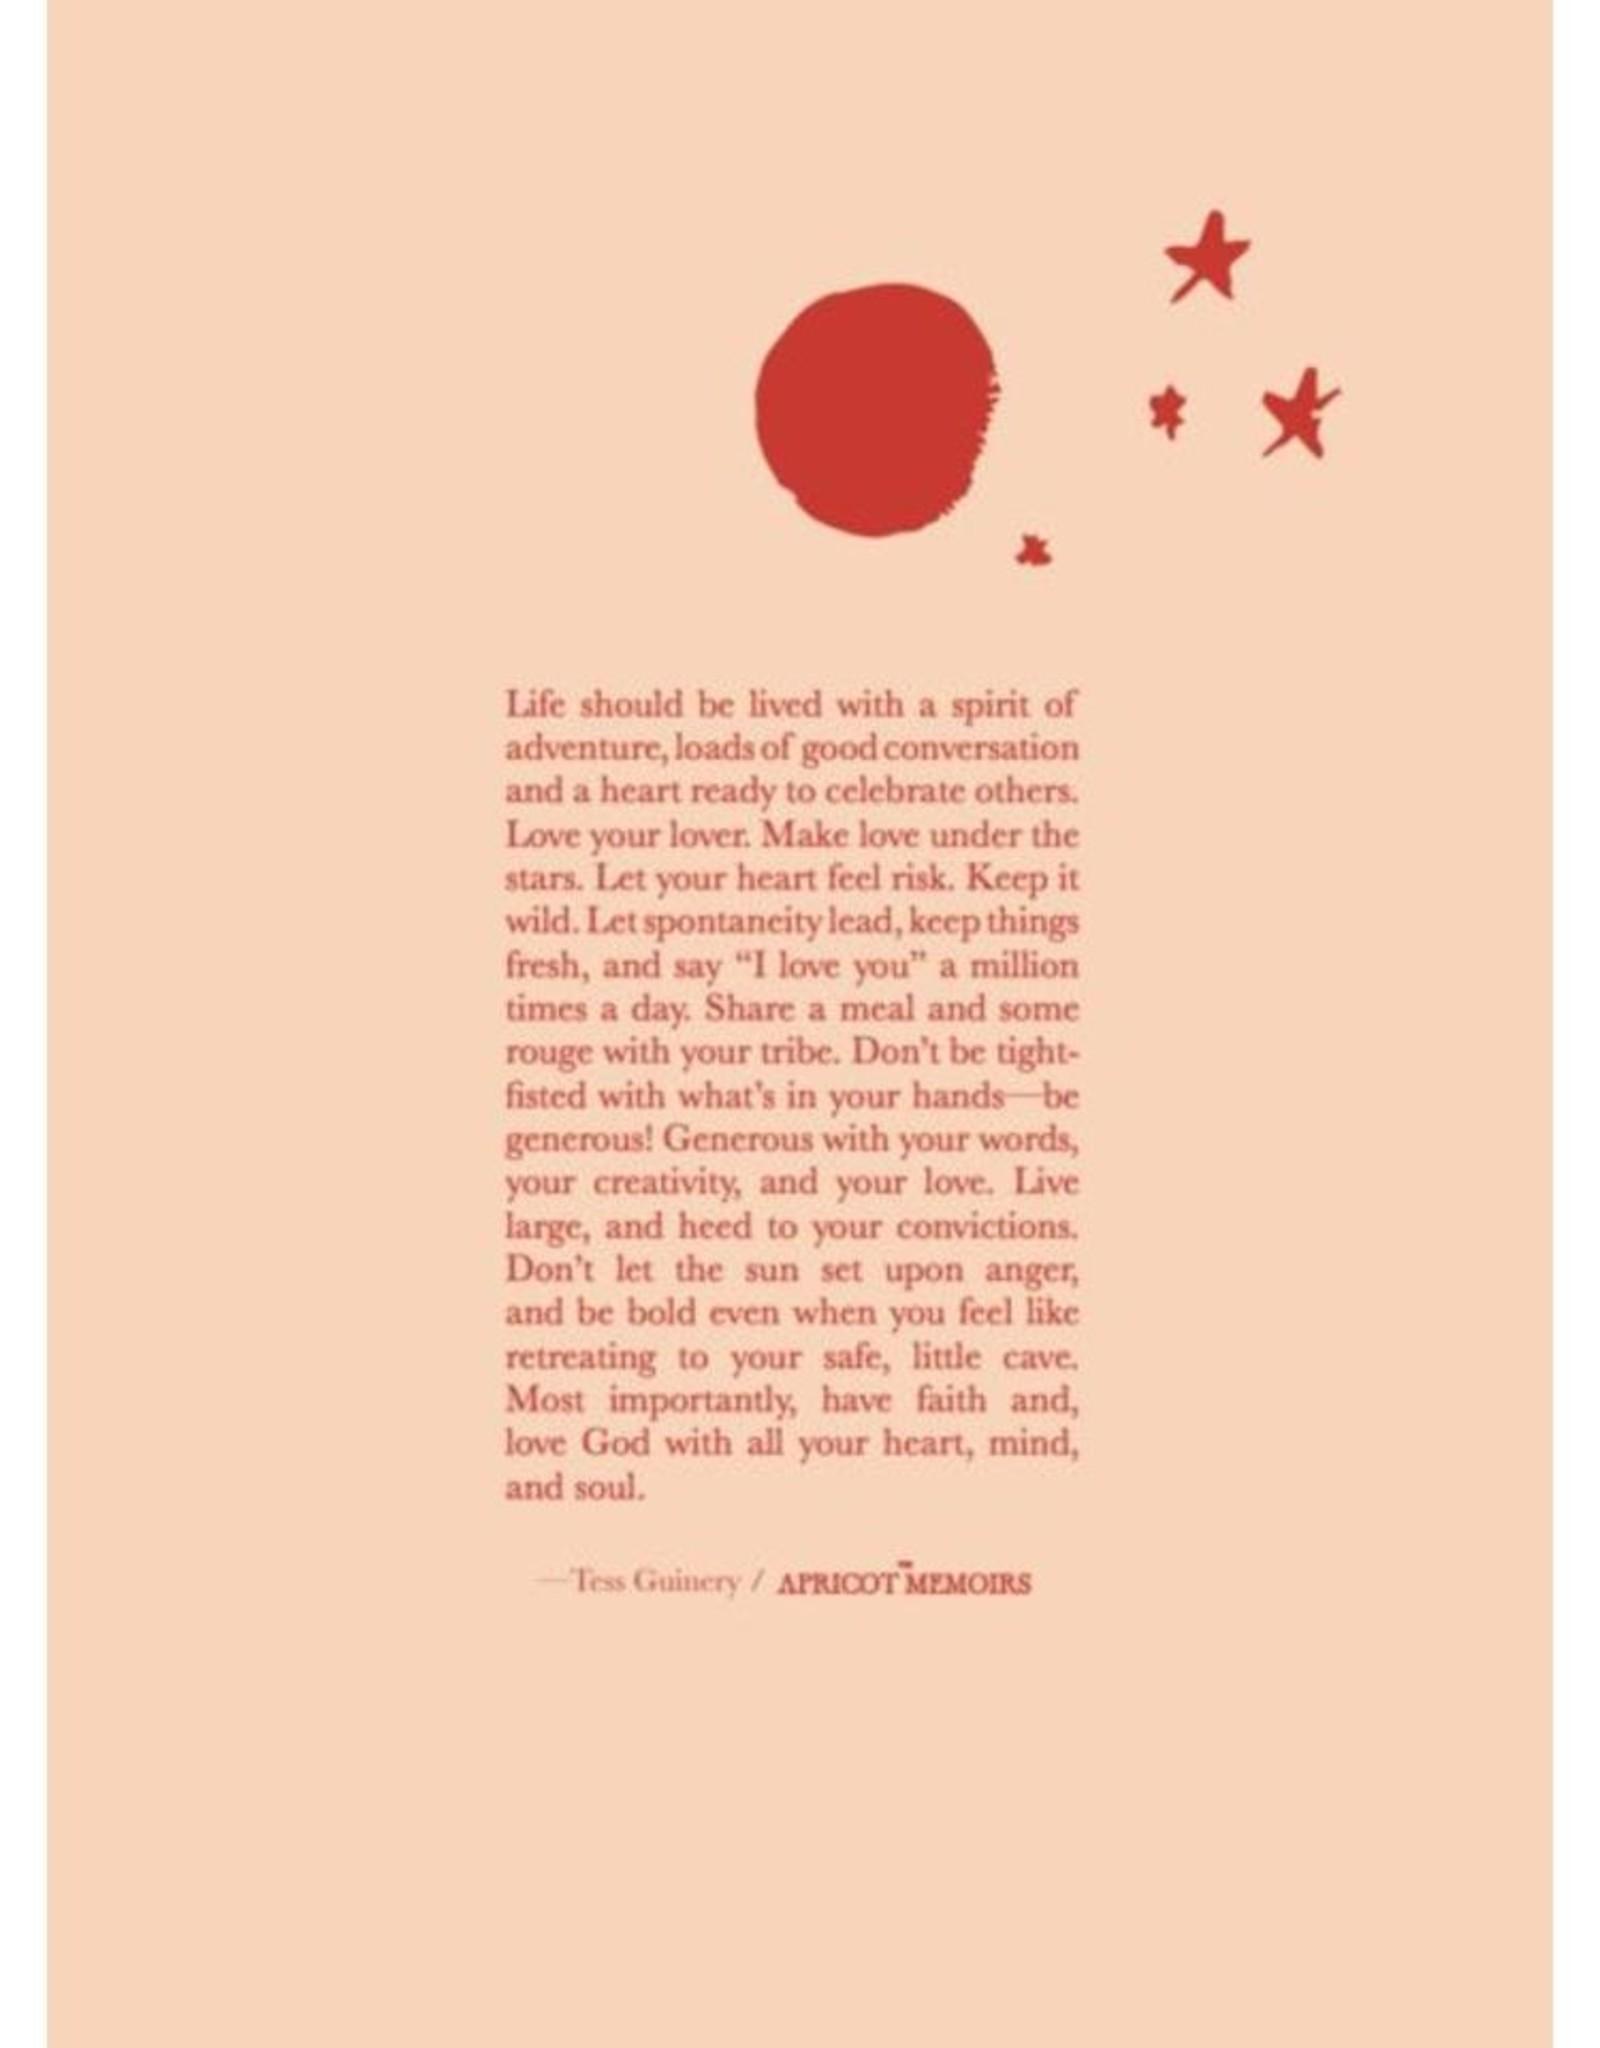 Tess Guinery TESS- The Apricot Memoirs